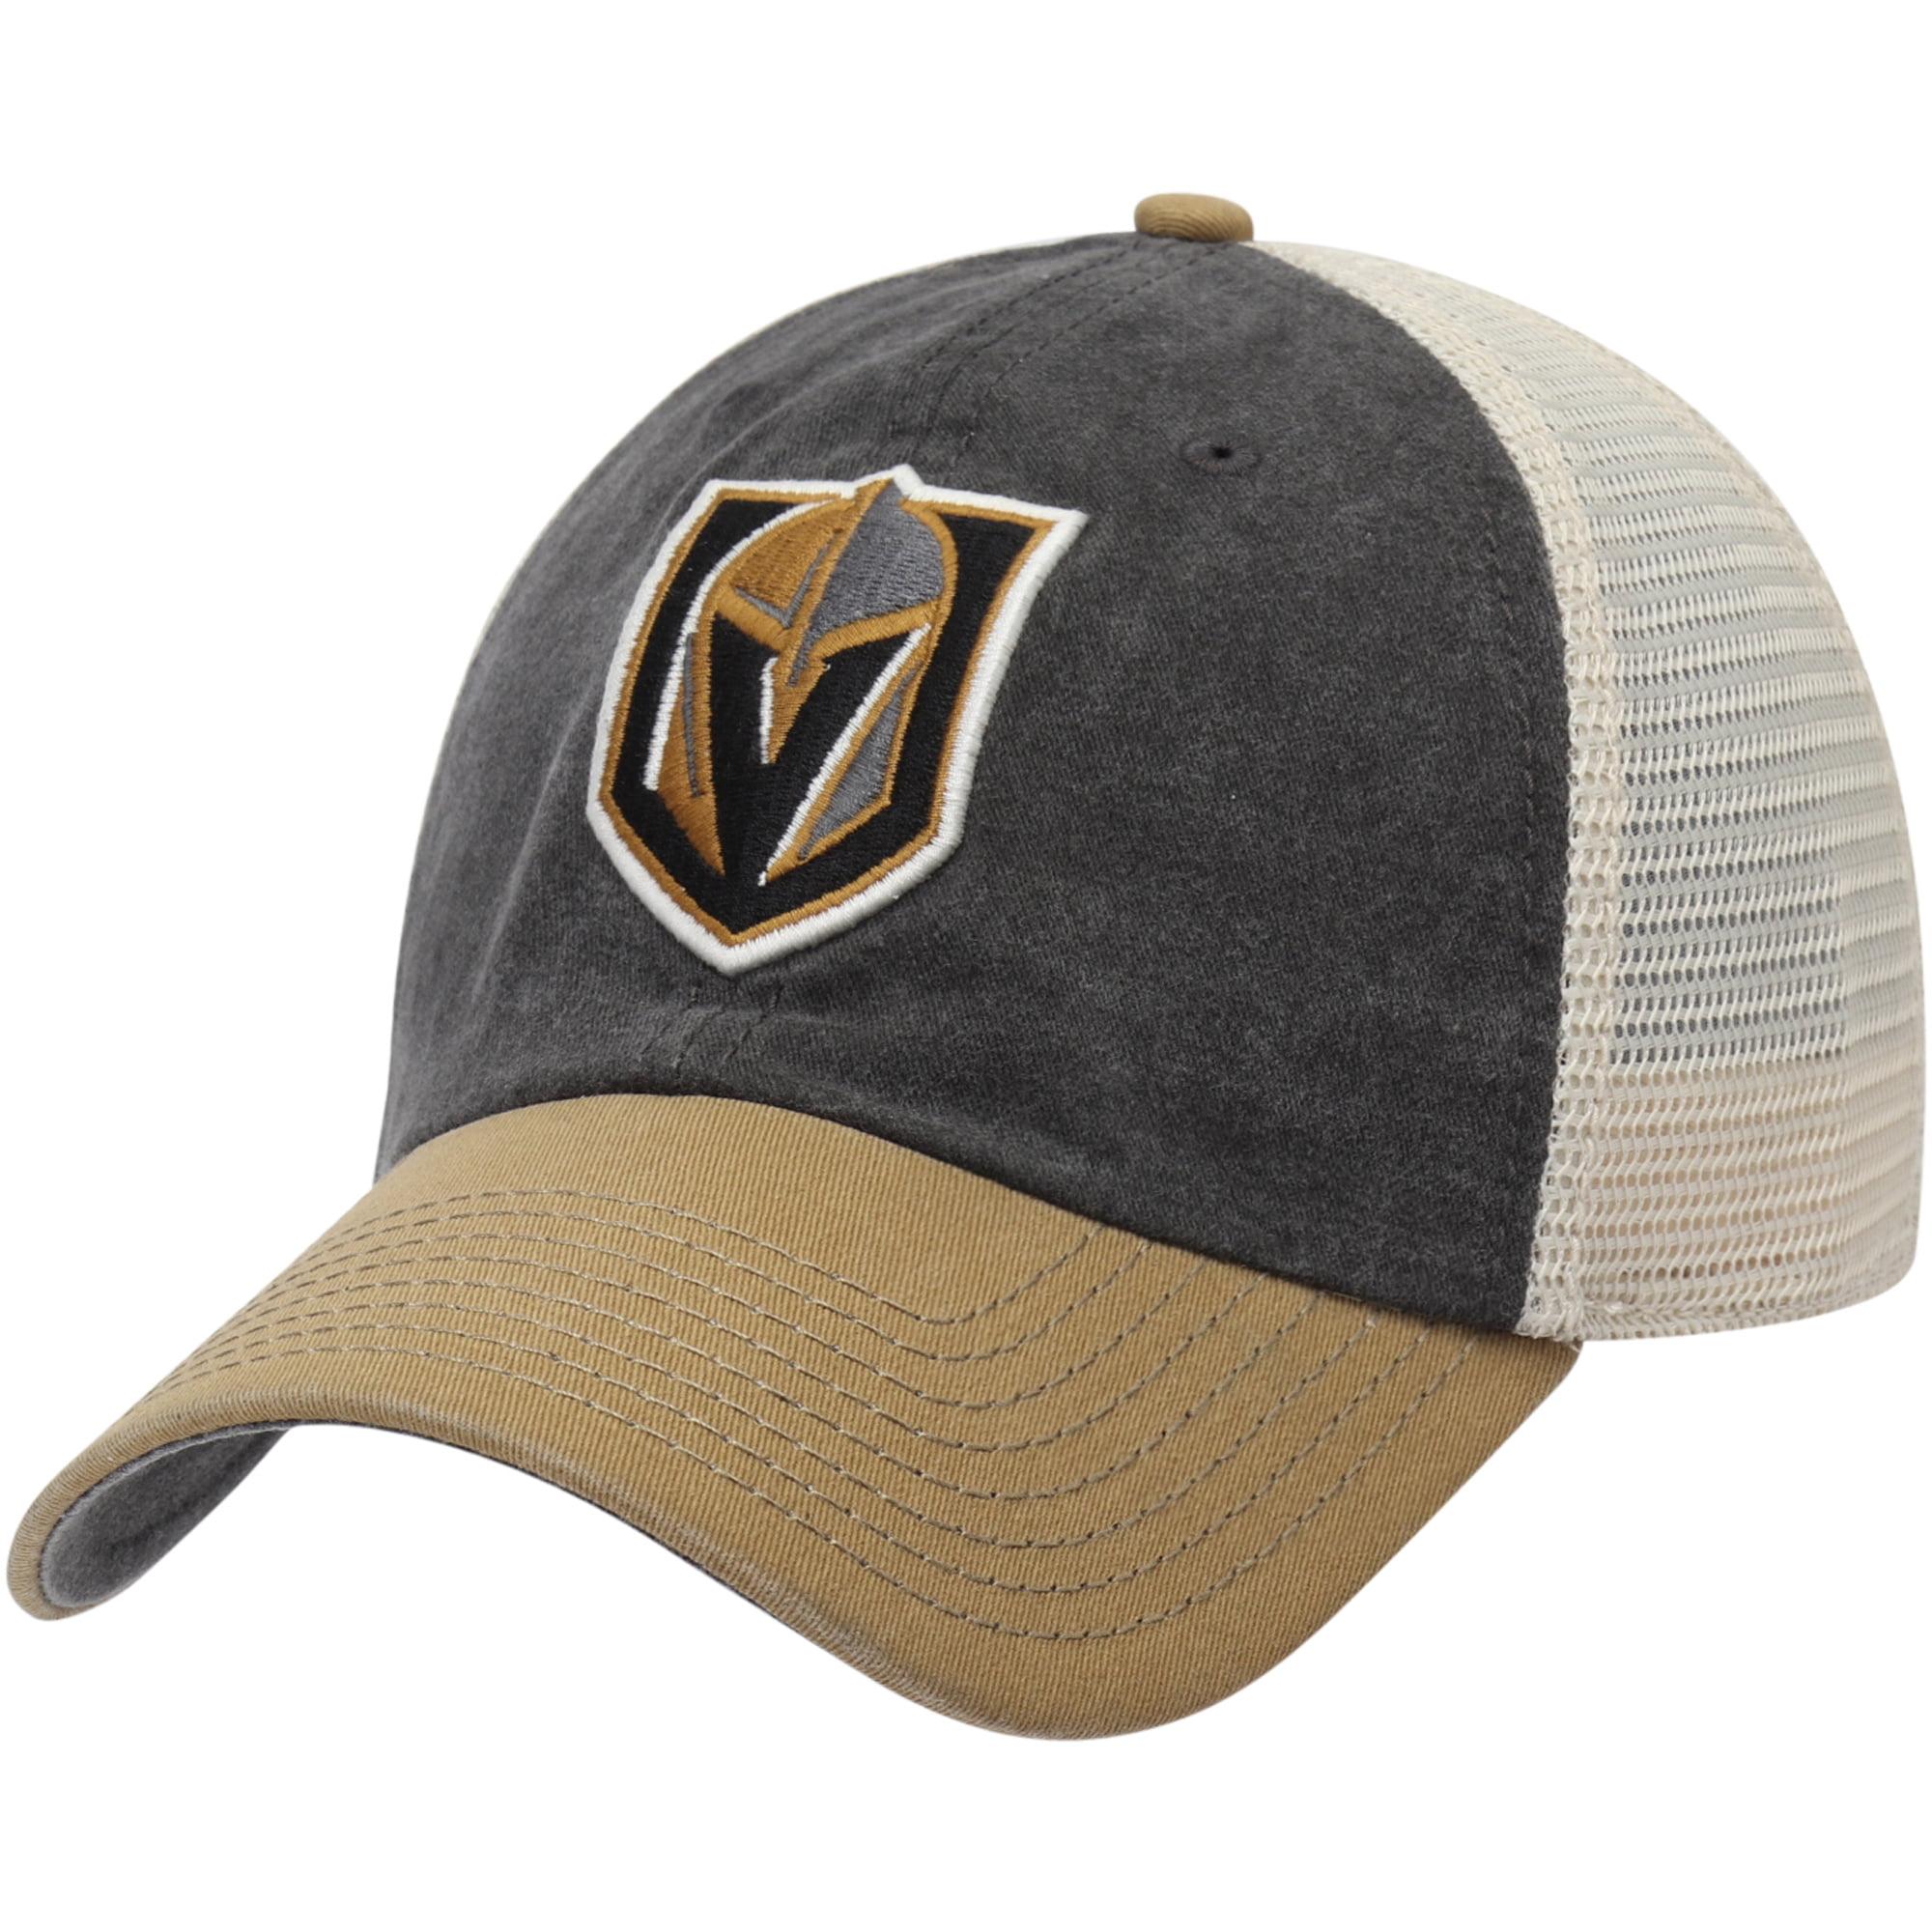 Vegas Golden Knights American Needle Hanover Unstructured Adjustable Hat - Gray/Vegas Gold - OSFA